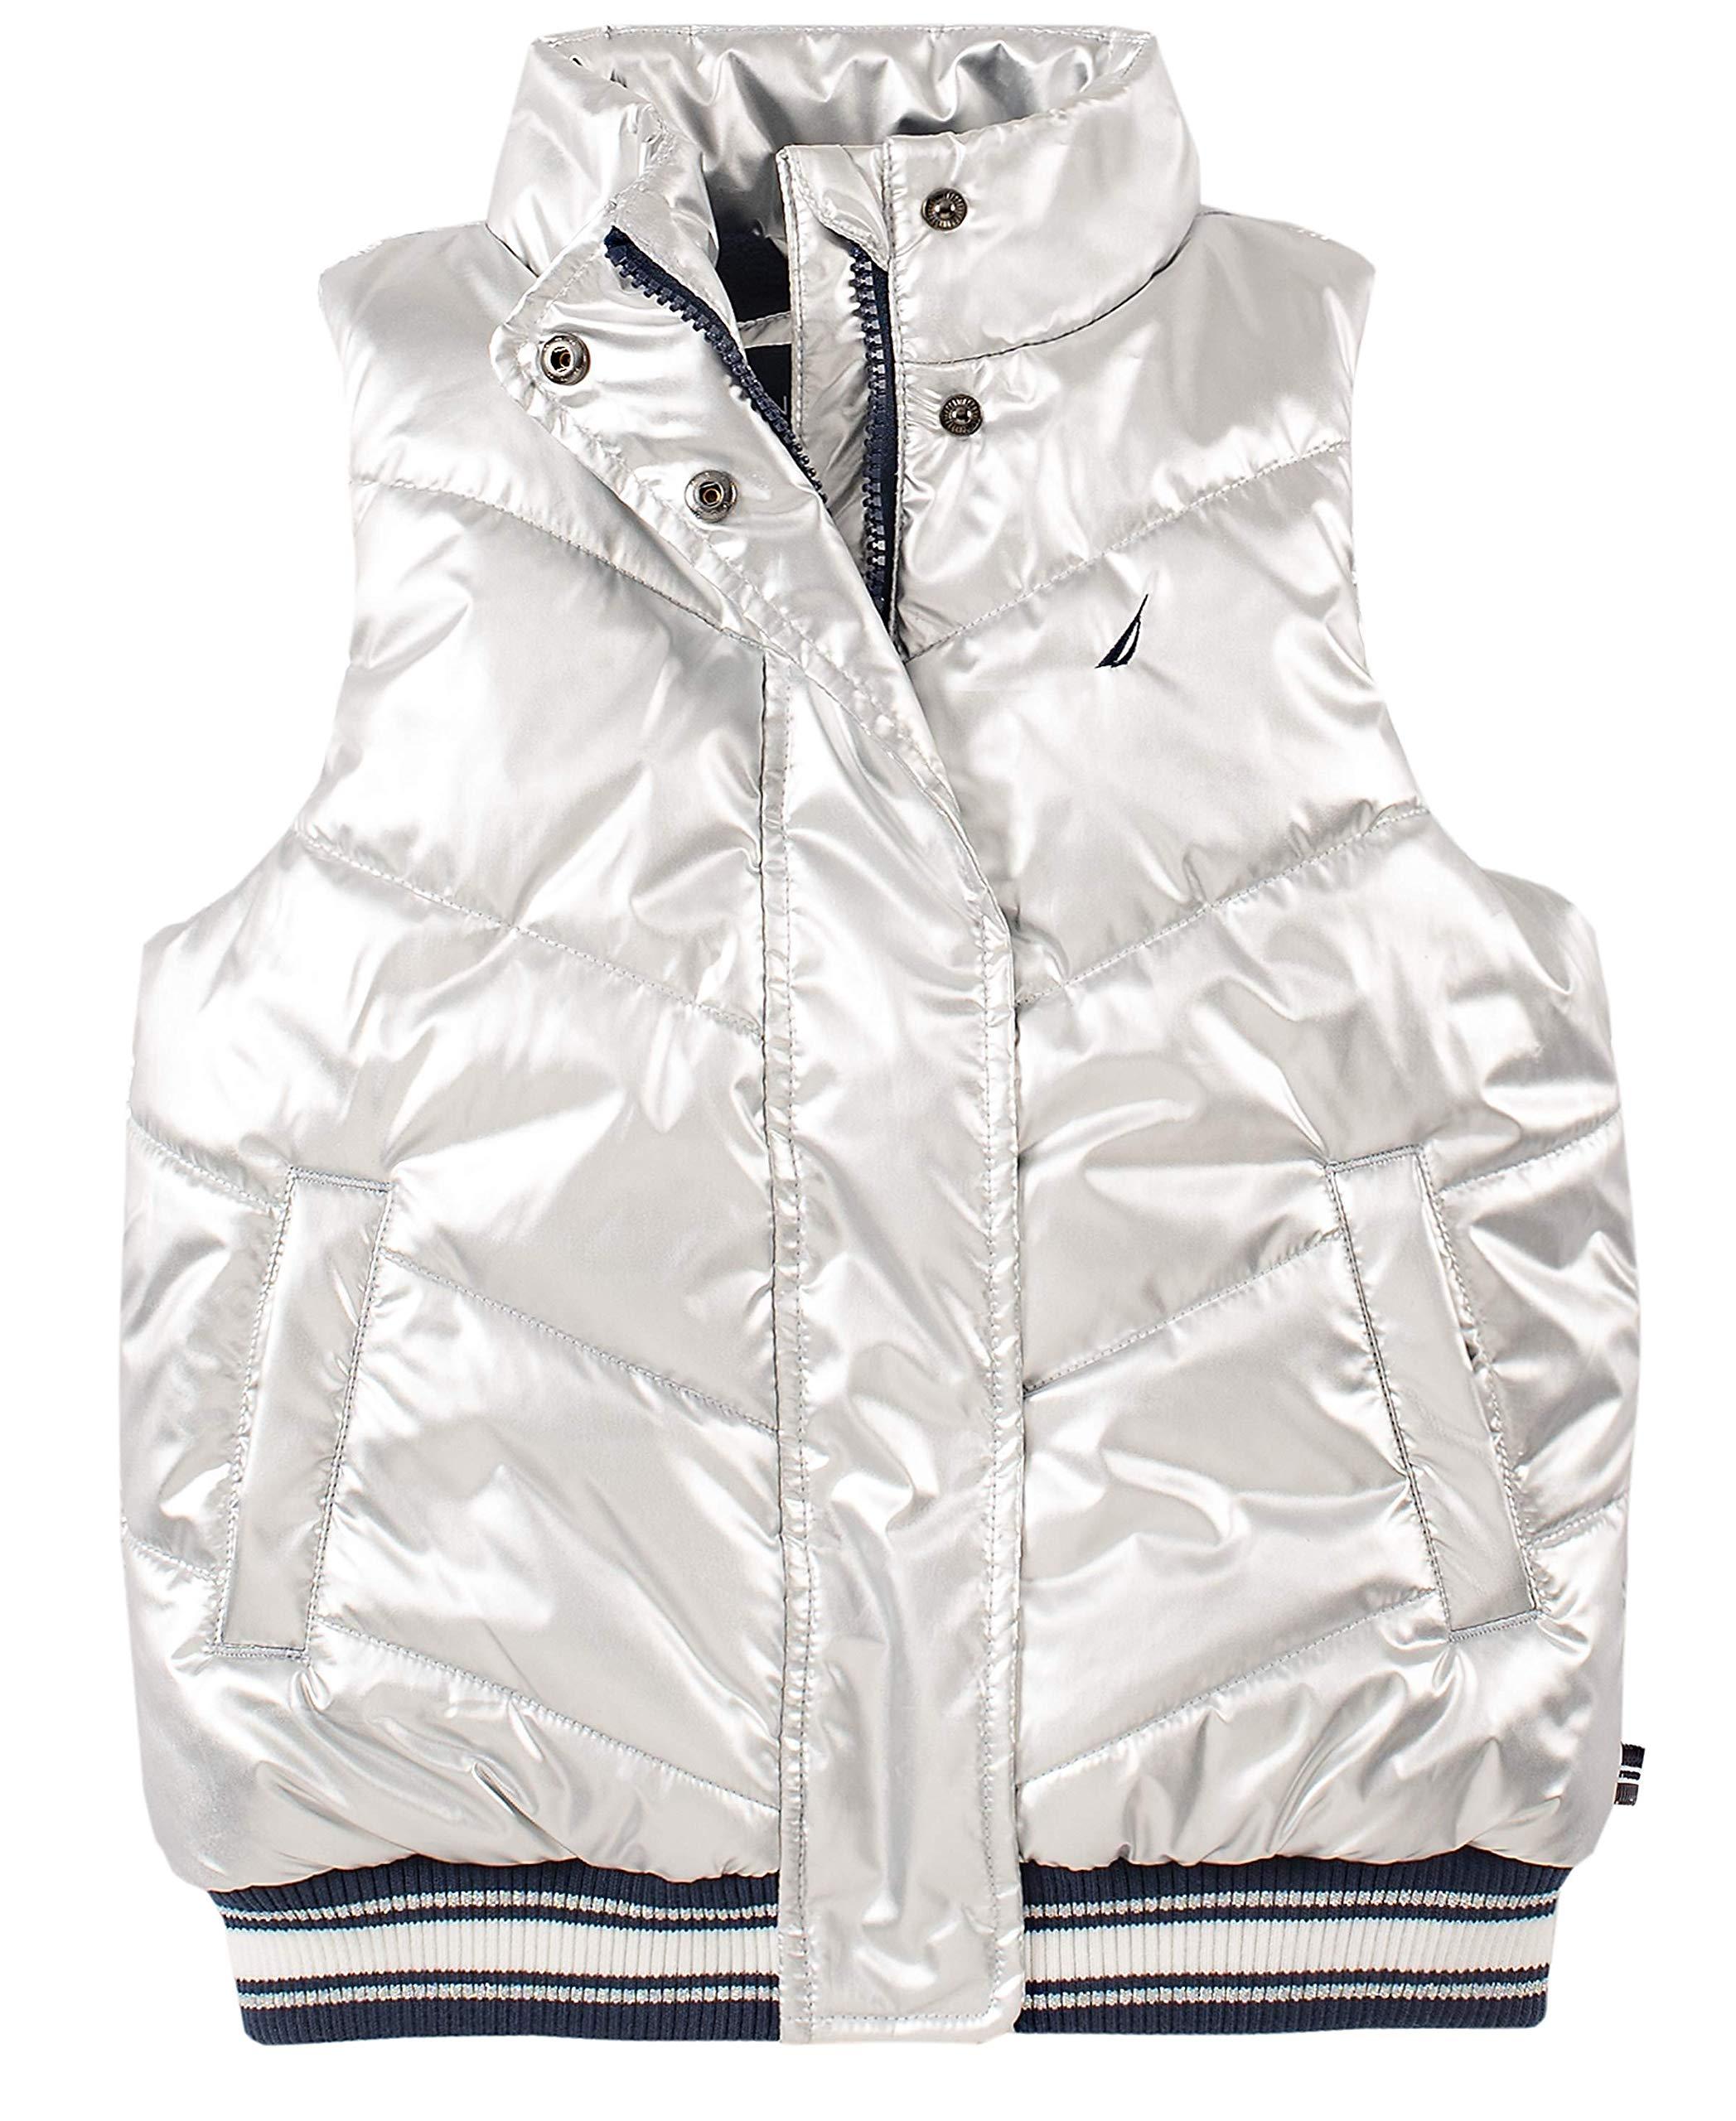 Nautica Little Girls' Puffer Vest, Metallic Silver, 6 by Nautica